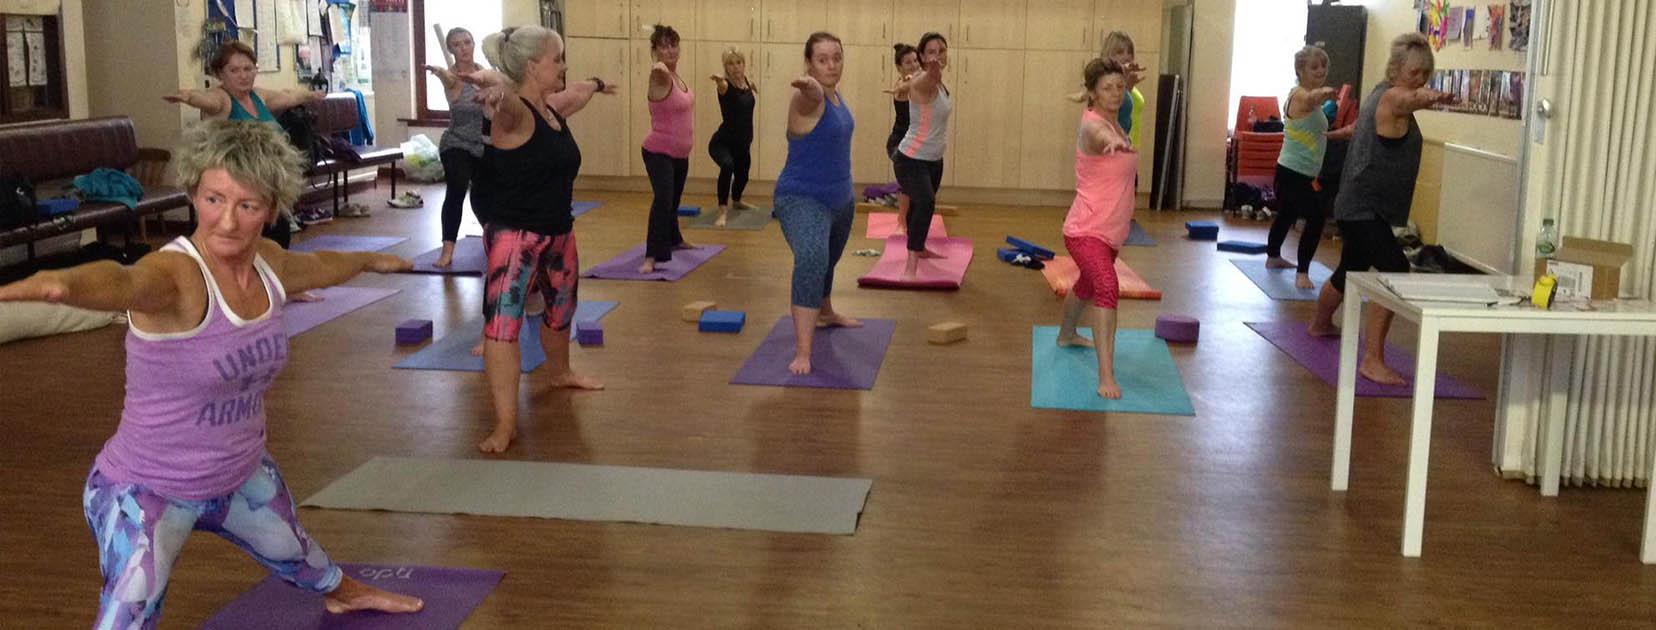 Yoga Rose Class